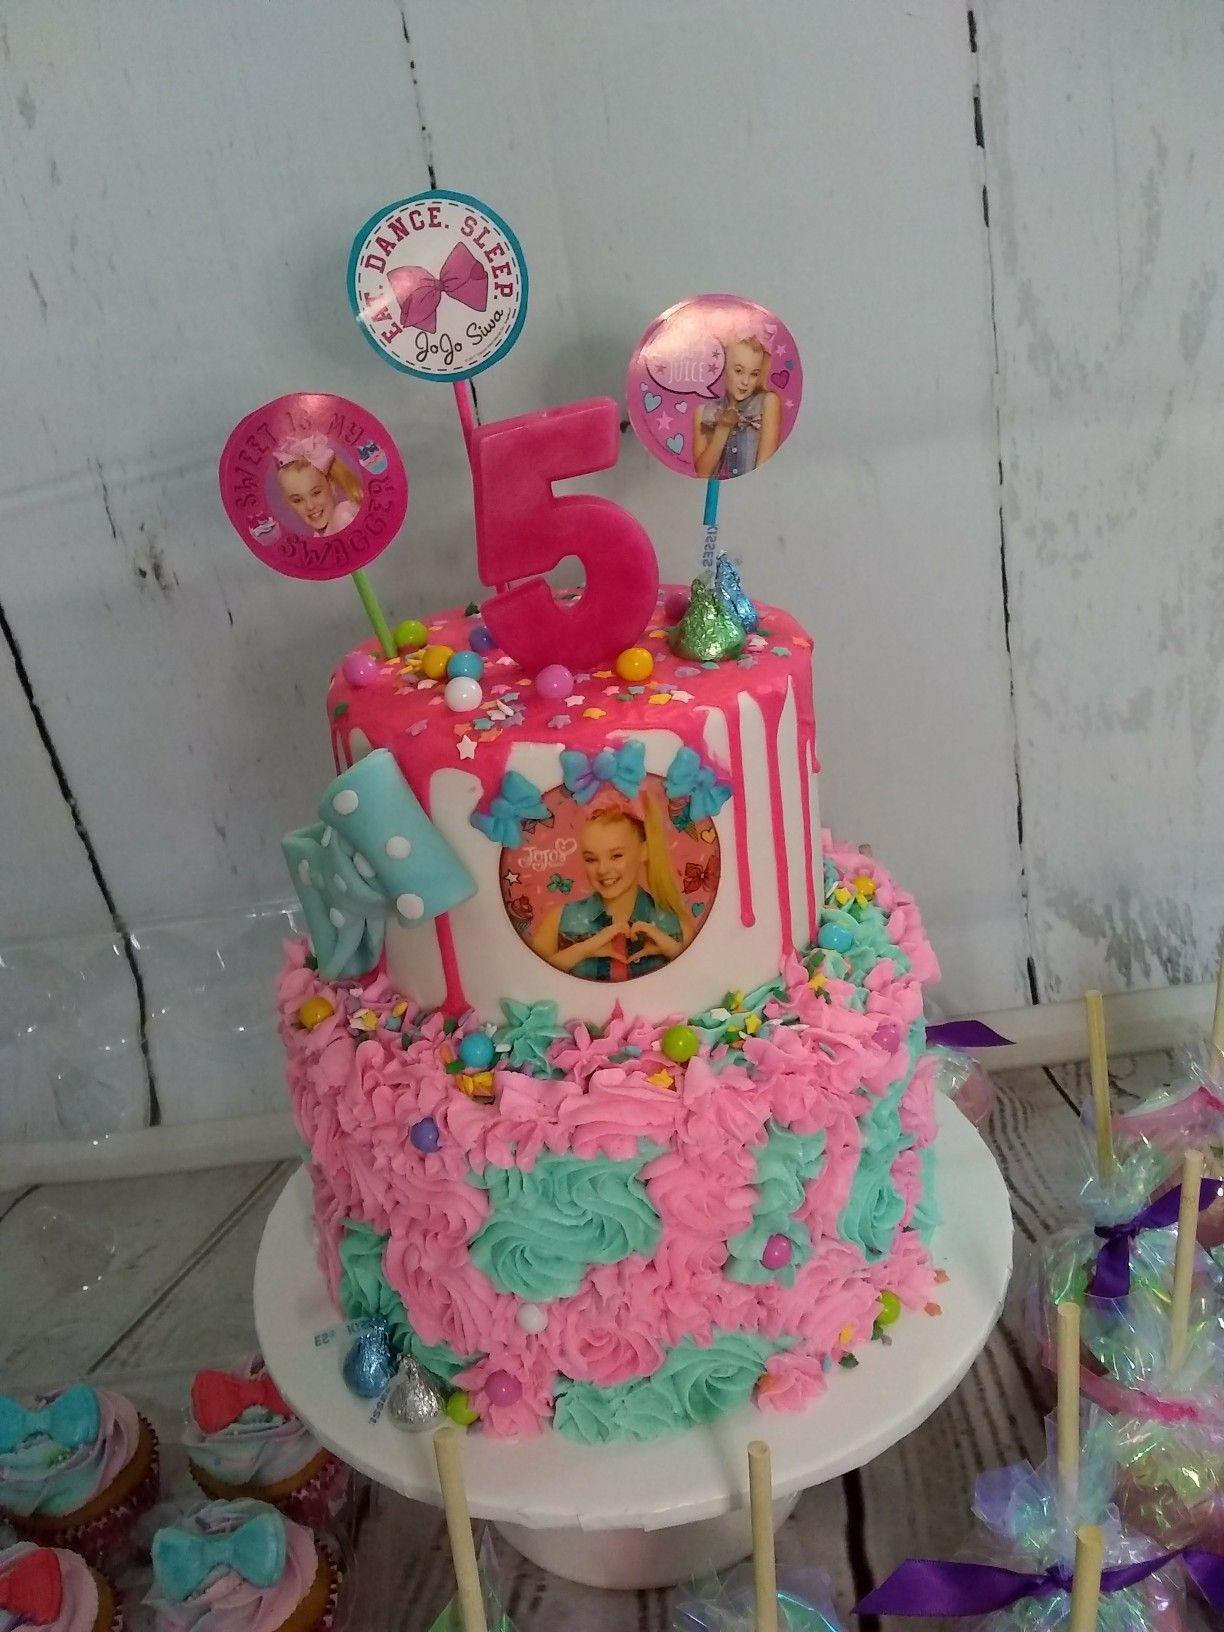 jojo cake siwa bows baked.tasty.houston Party cakes